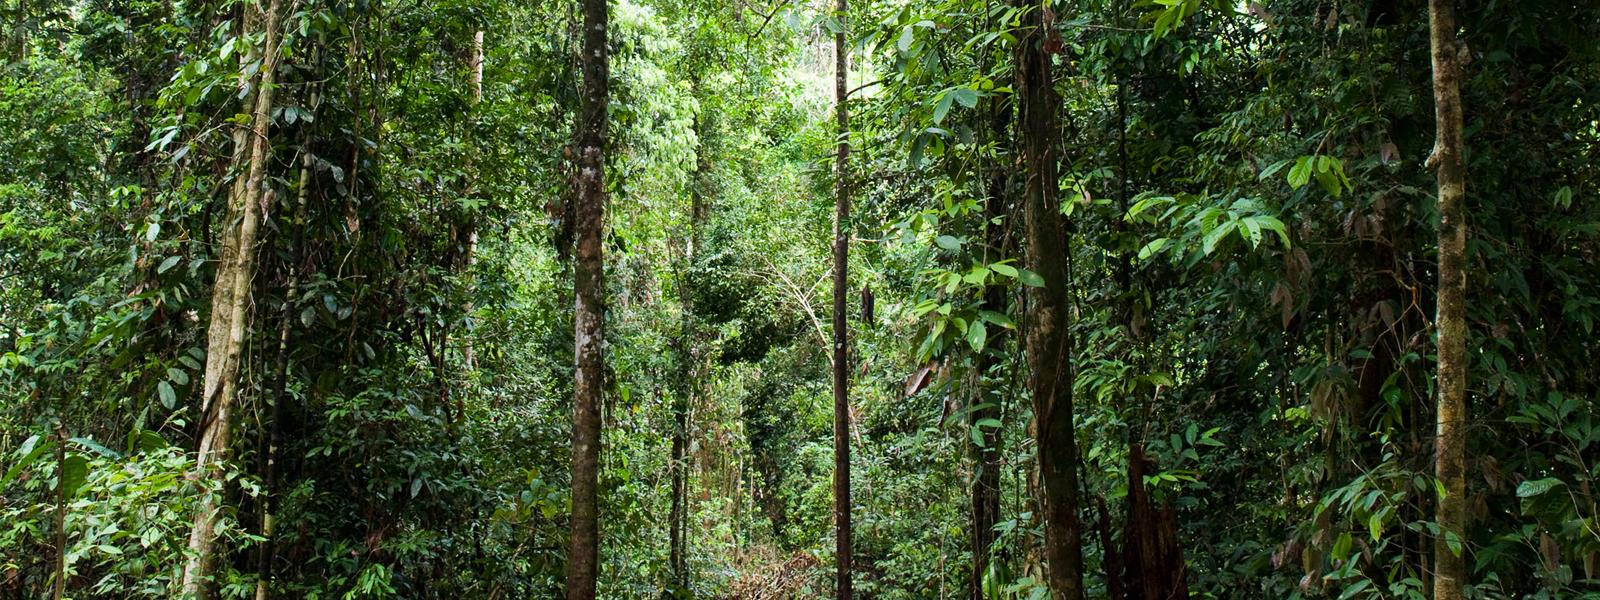 forest habitat habitats wwf forest east kalimantan borneo